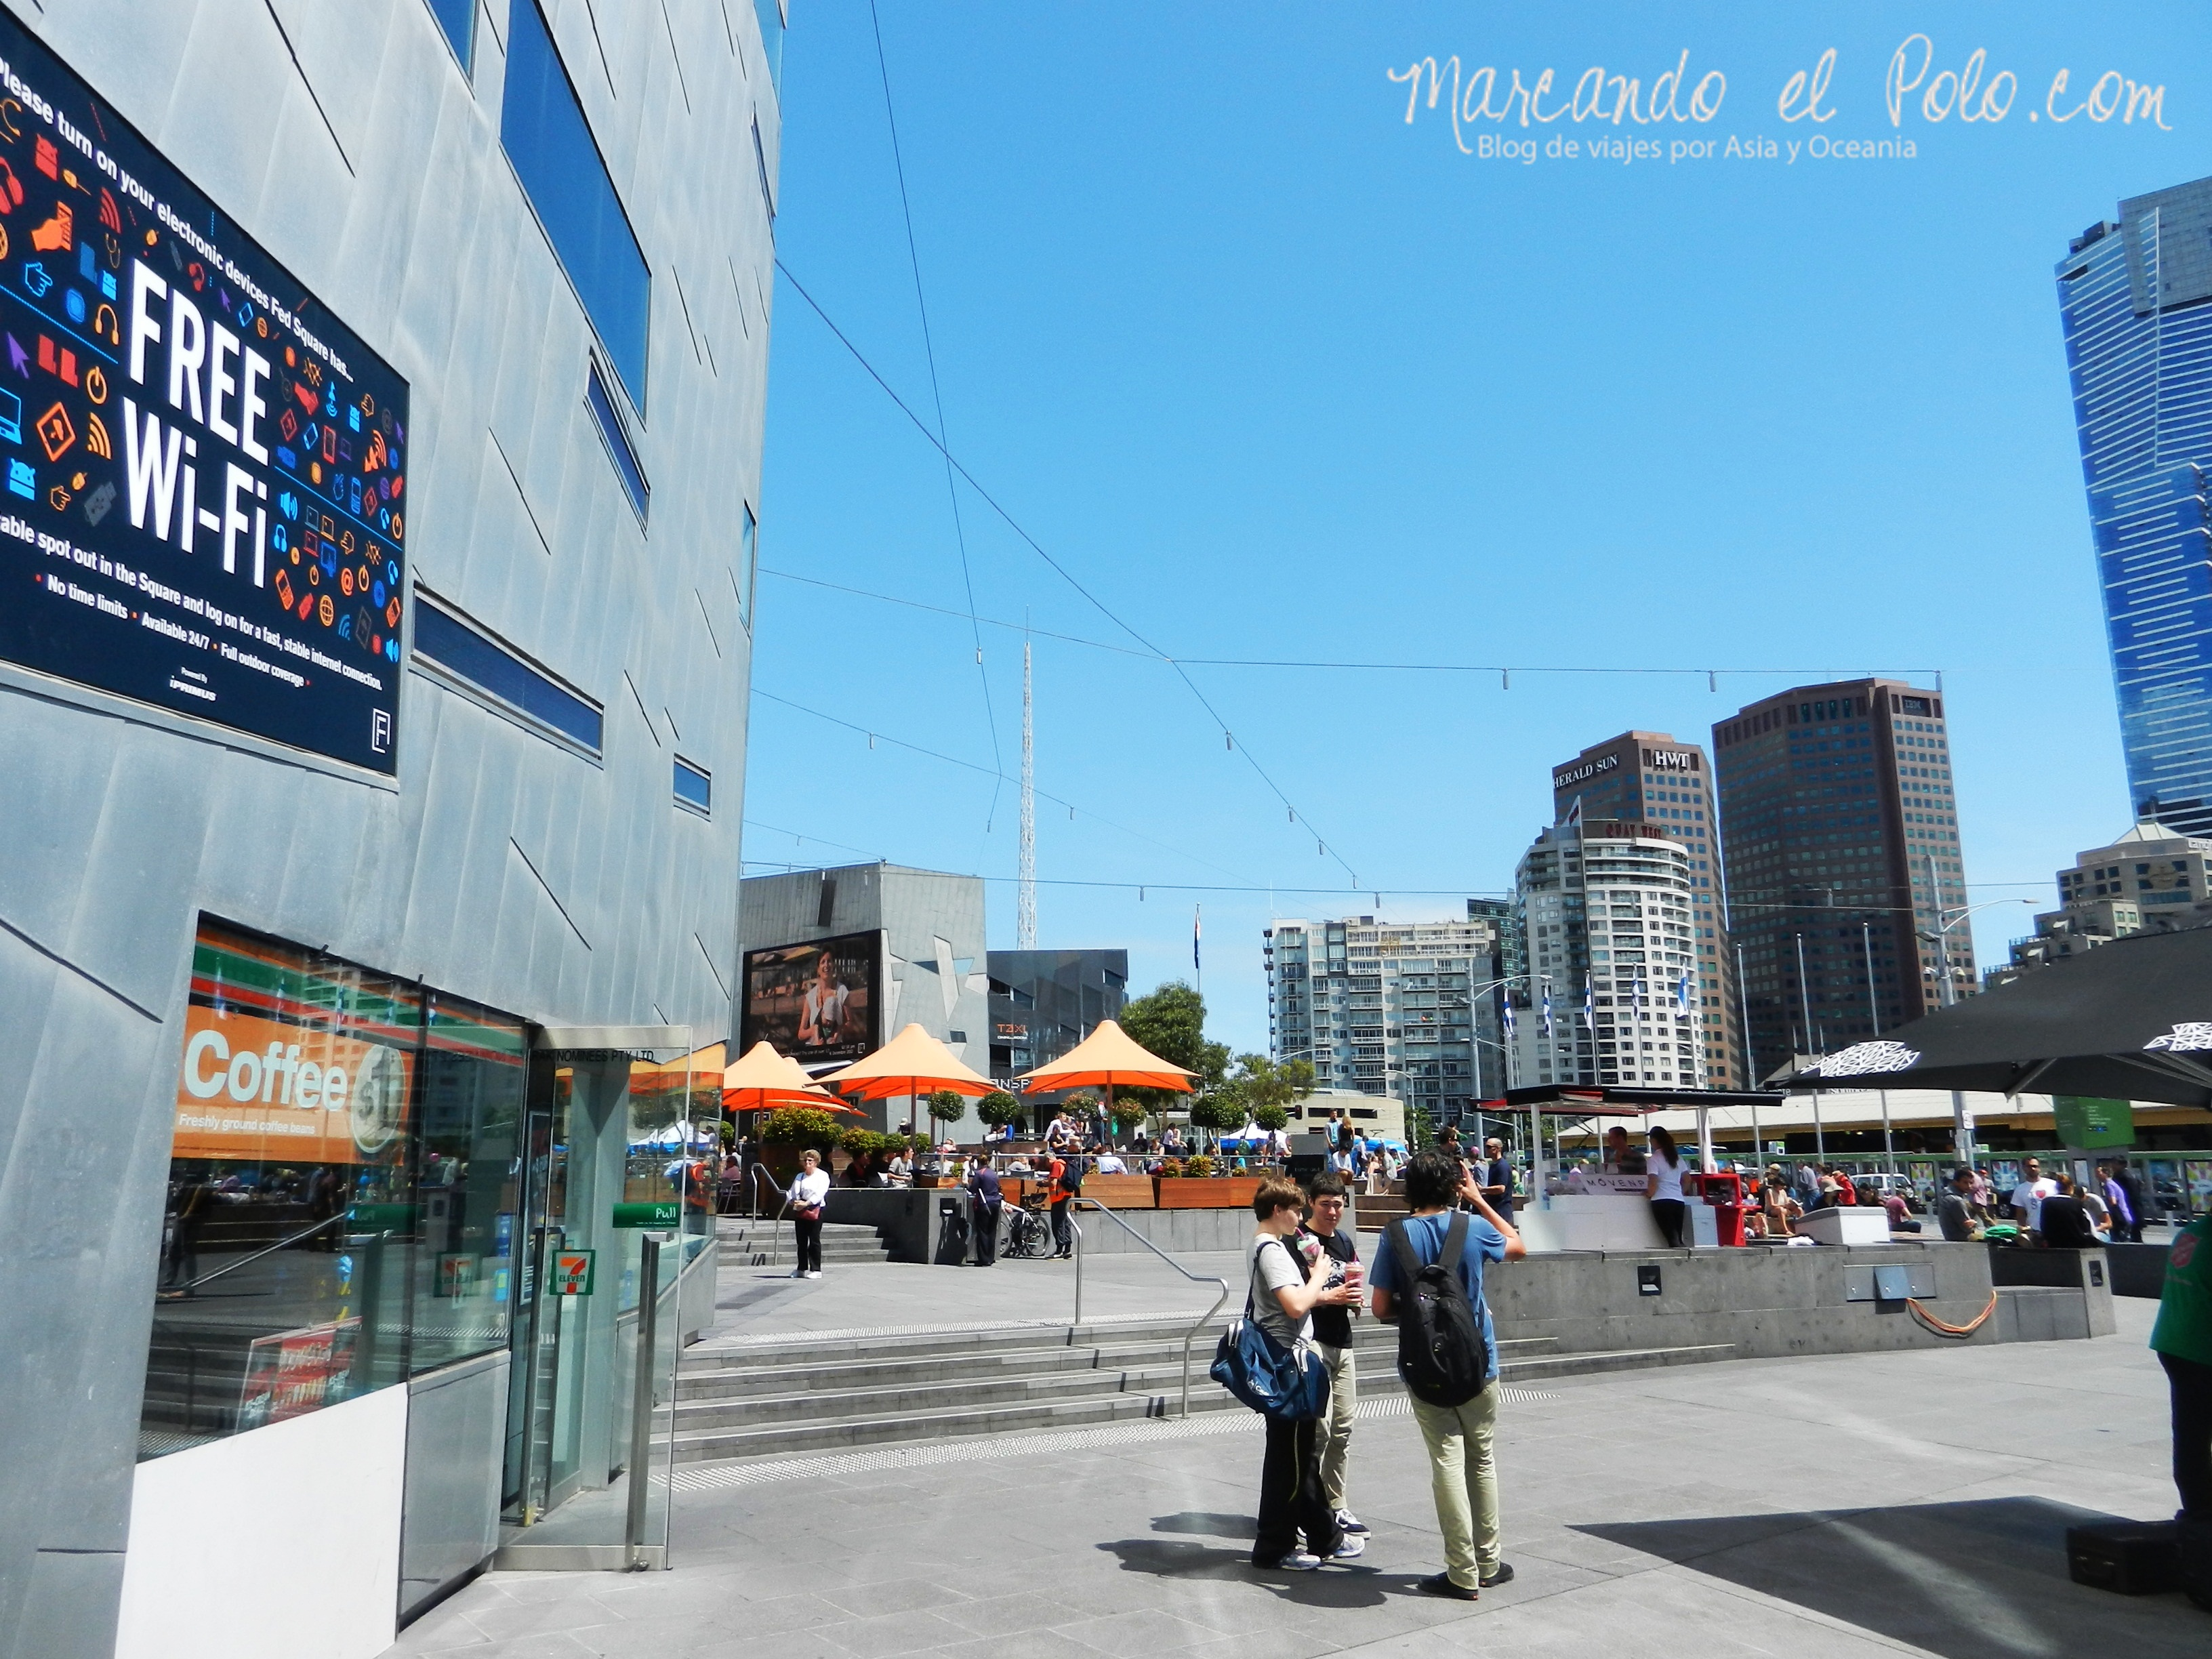 Viajar barato por Melbourne: Wifi gratuito en Federation Square.